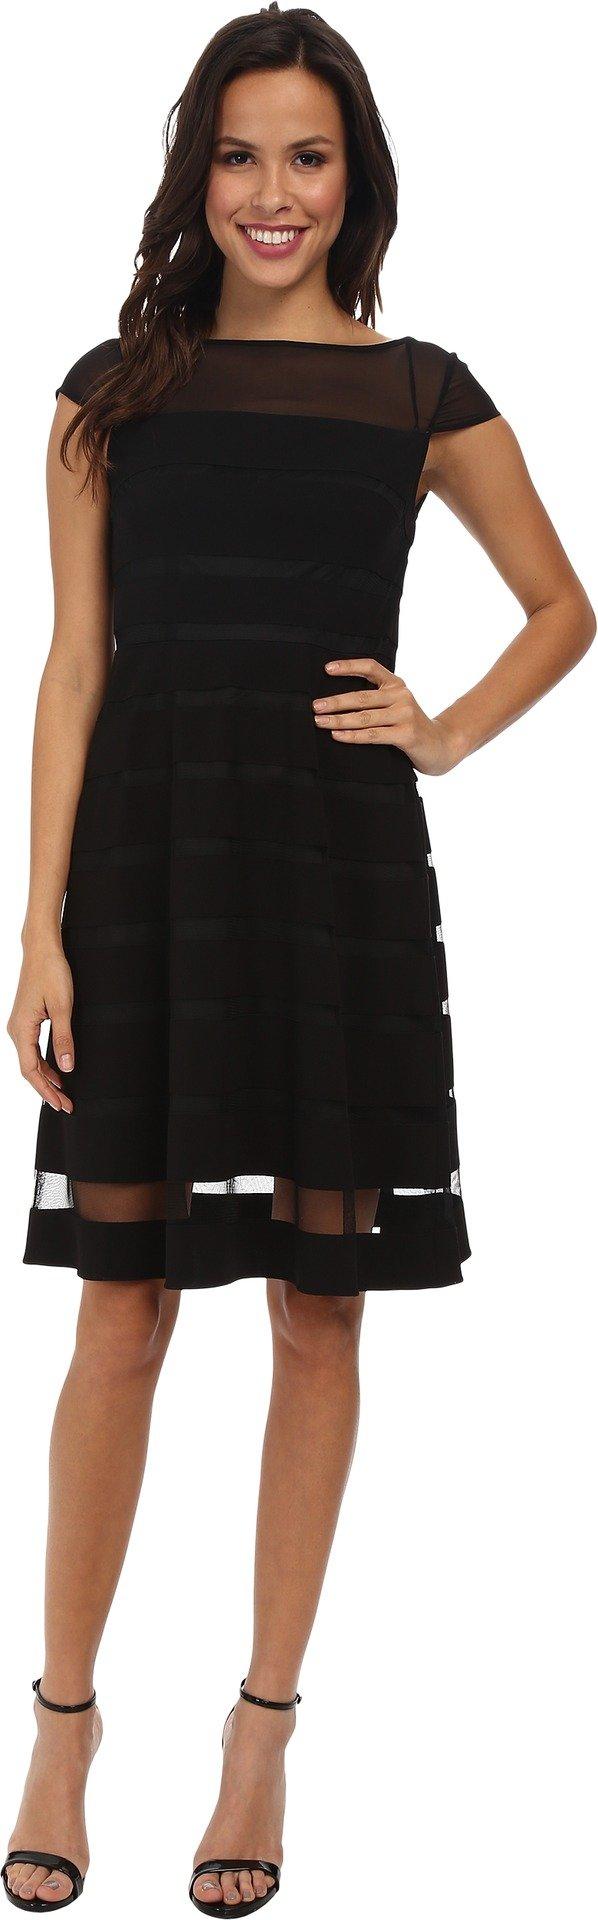 Adrianna Papell Women's Gradiated Chiffon Bands Dress, black, 12